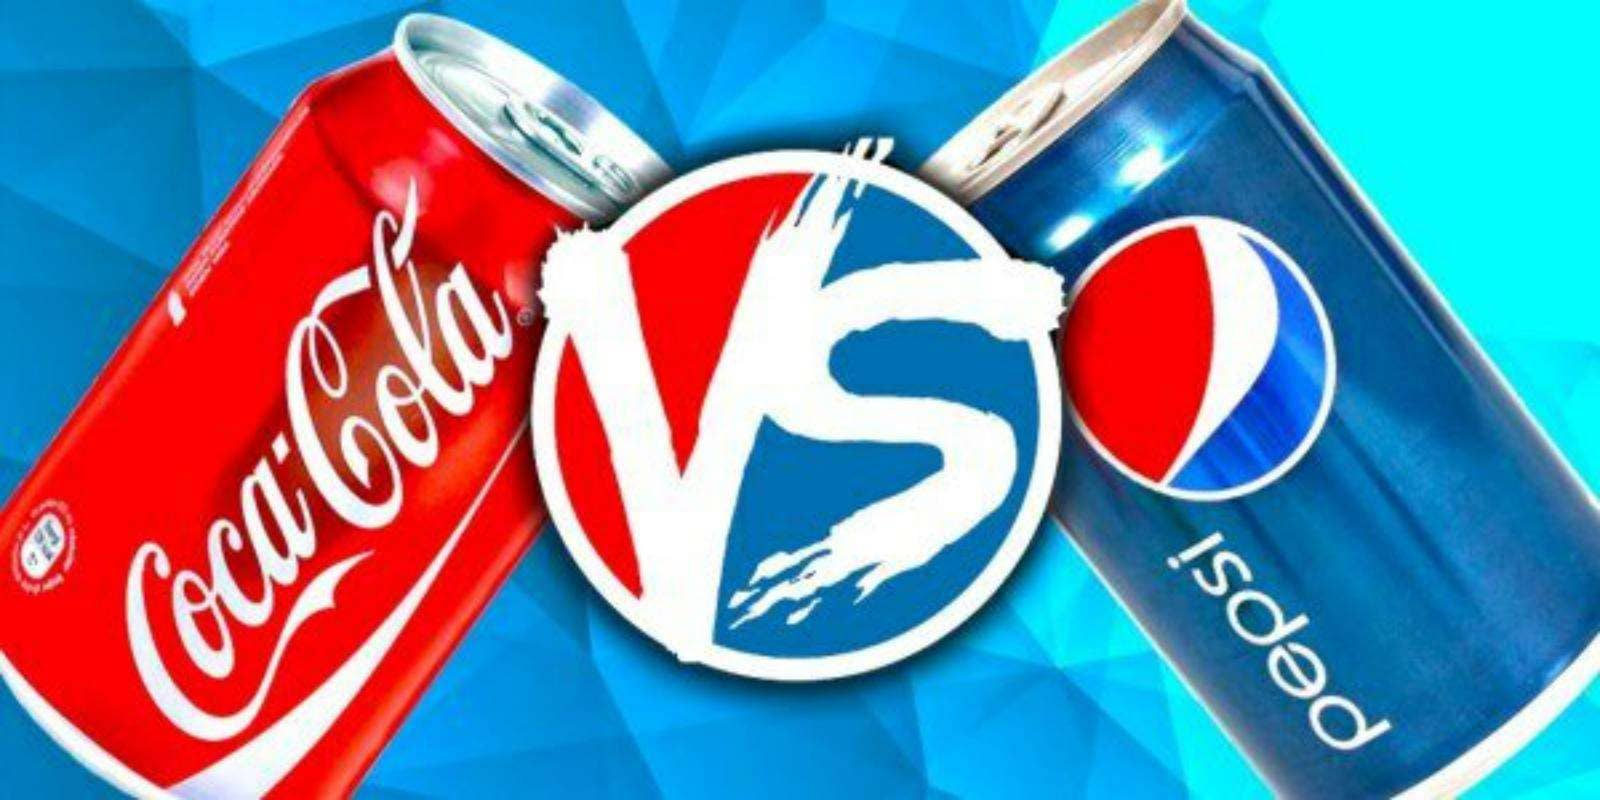 Противостояние гигантов: Coca-Cola и Pepsi